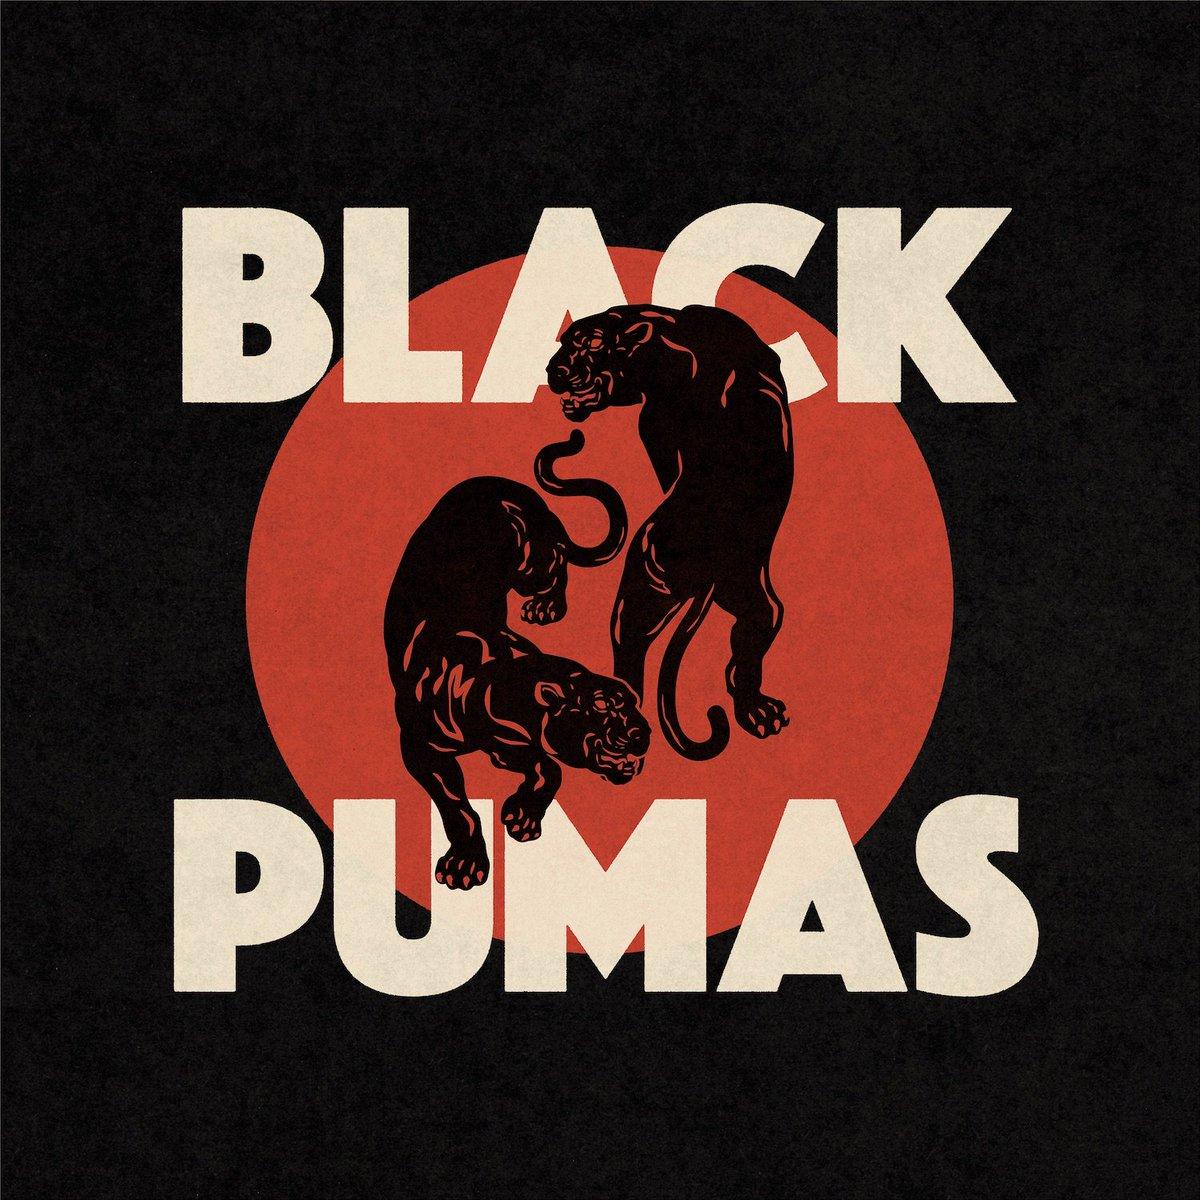 acheter en ligne f9d7d fdb6d Black Pumas (@BlackPumasMusic)   Twitter